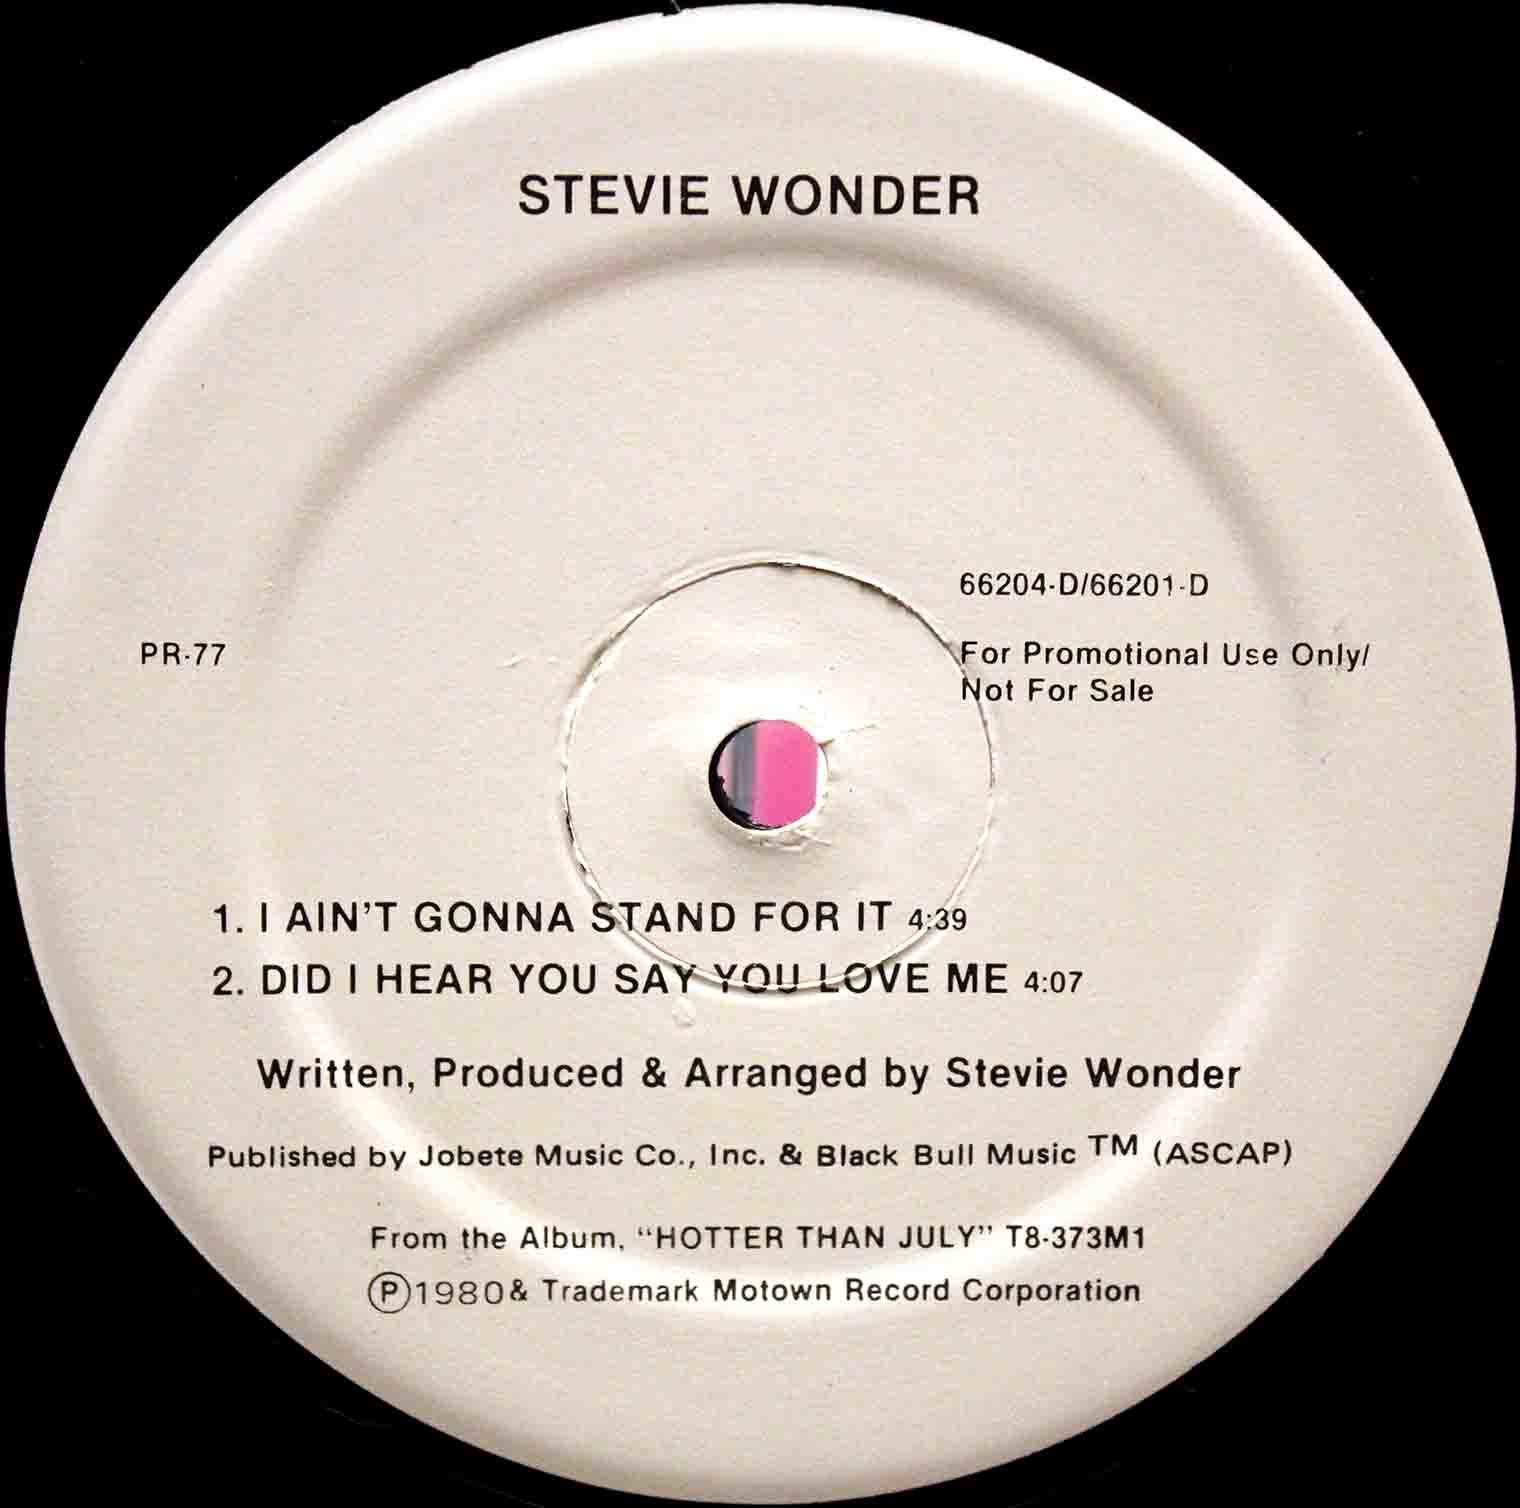 Stevie Wonder – Did I Hear You Say You Love Me 02